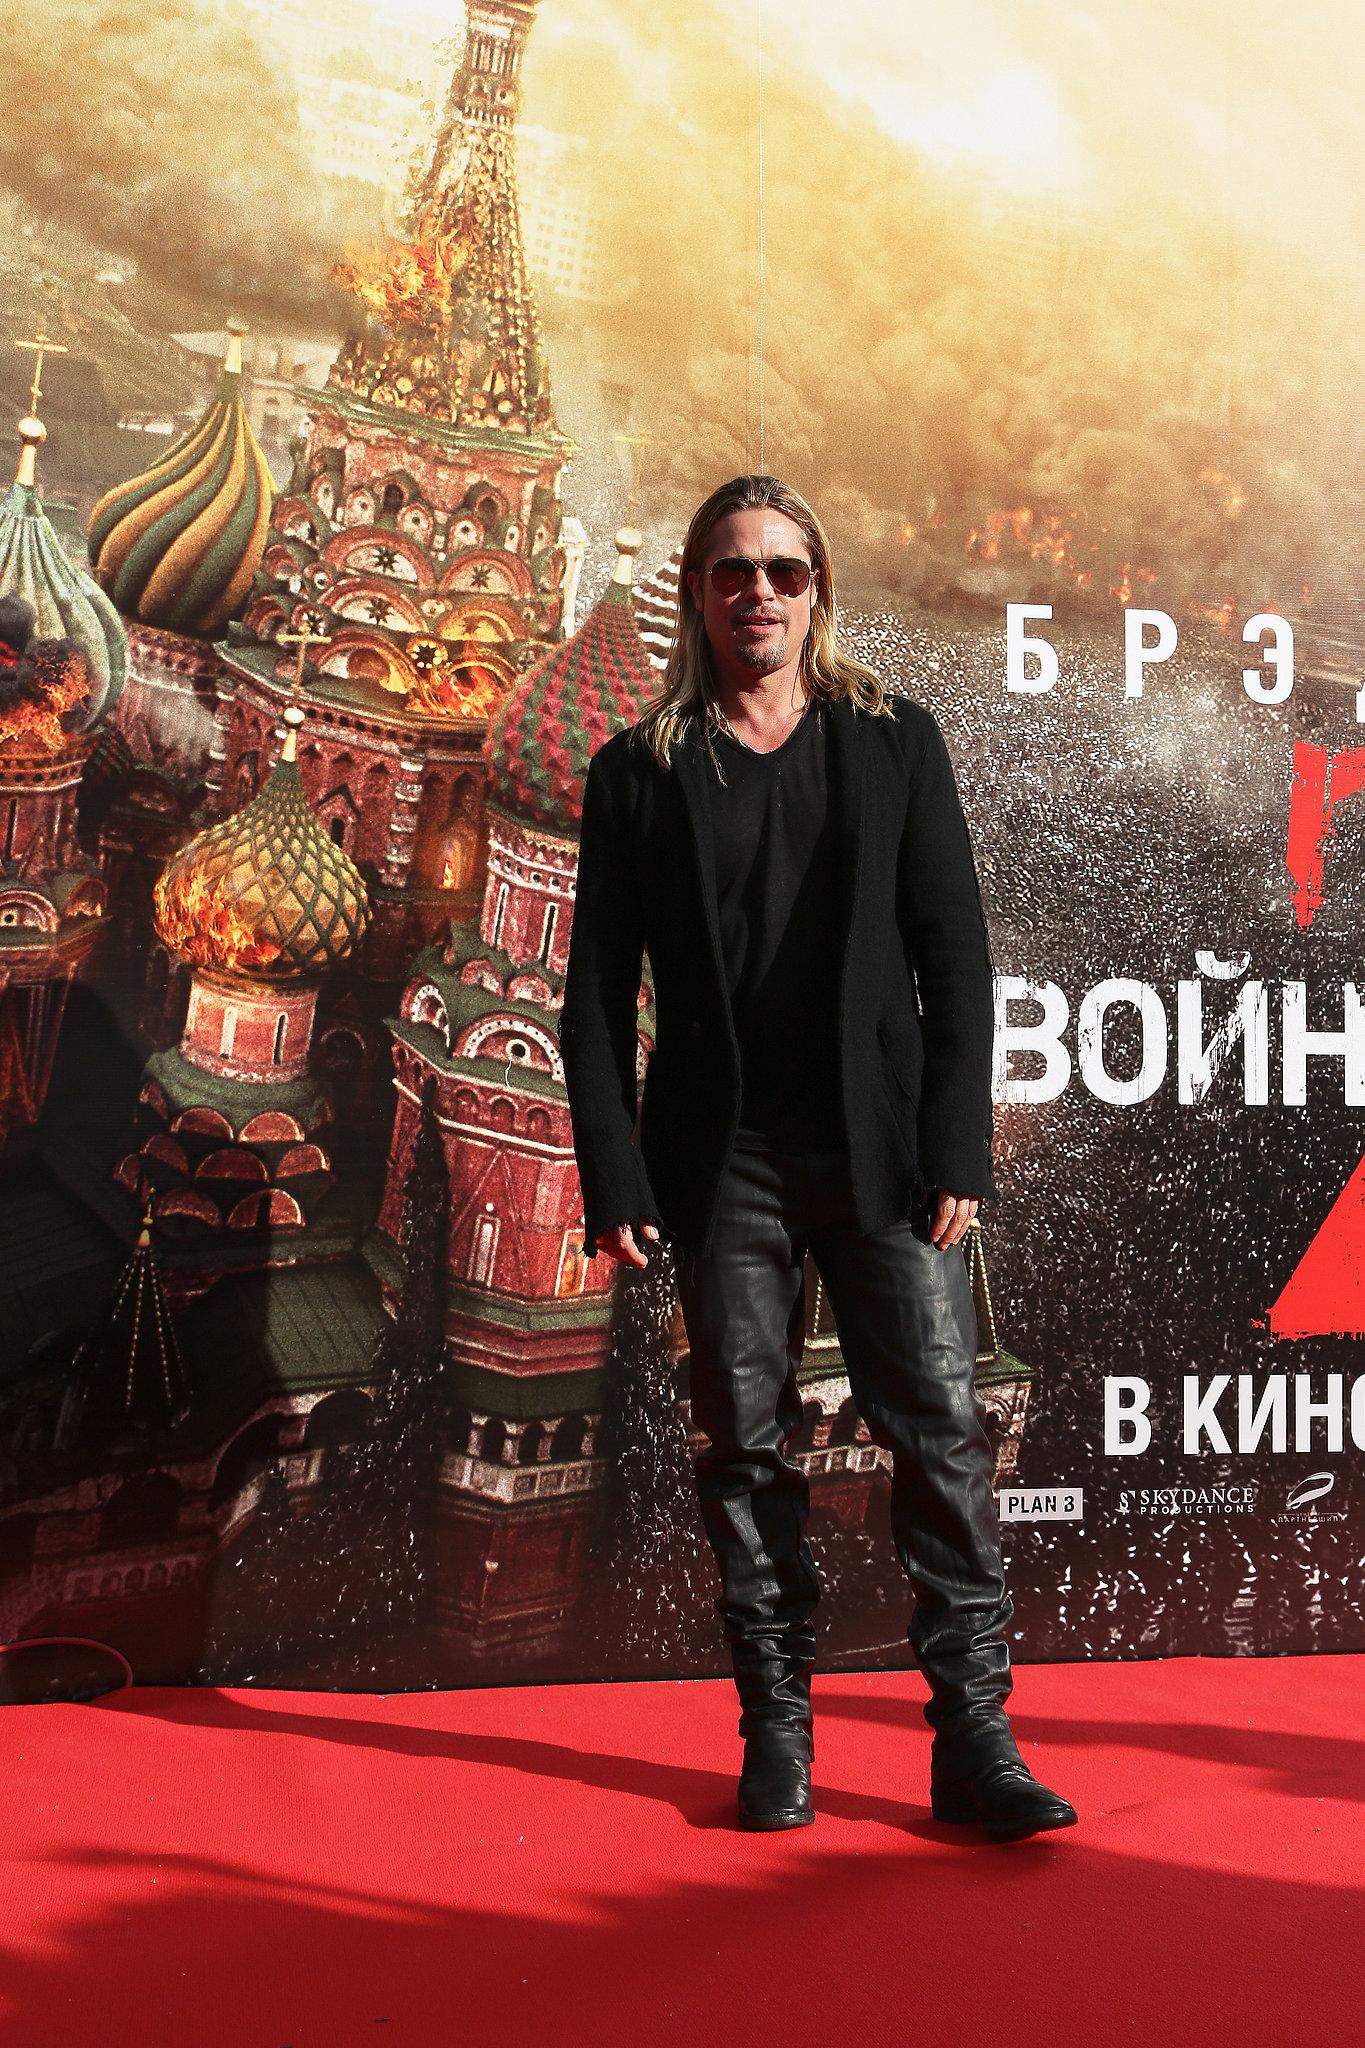 Brad Pitt Tours Russia With Shiloh and Zahara!